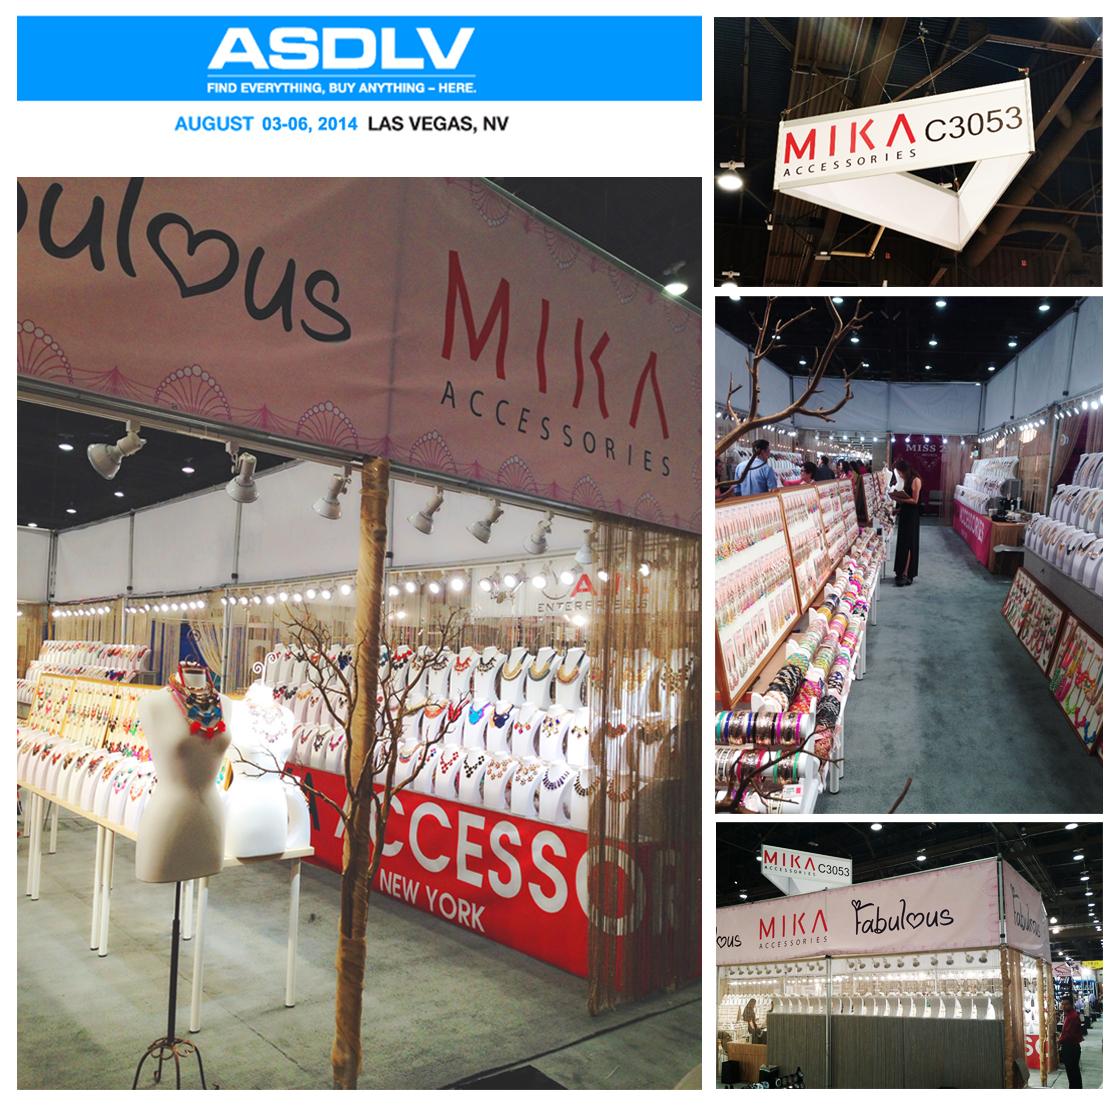 ASD SHOW AUGUST 2014 MIKA ACCESSORIES